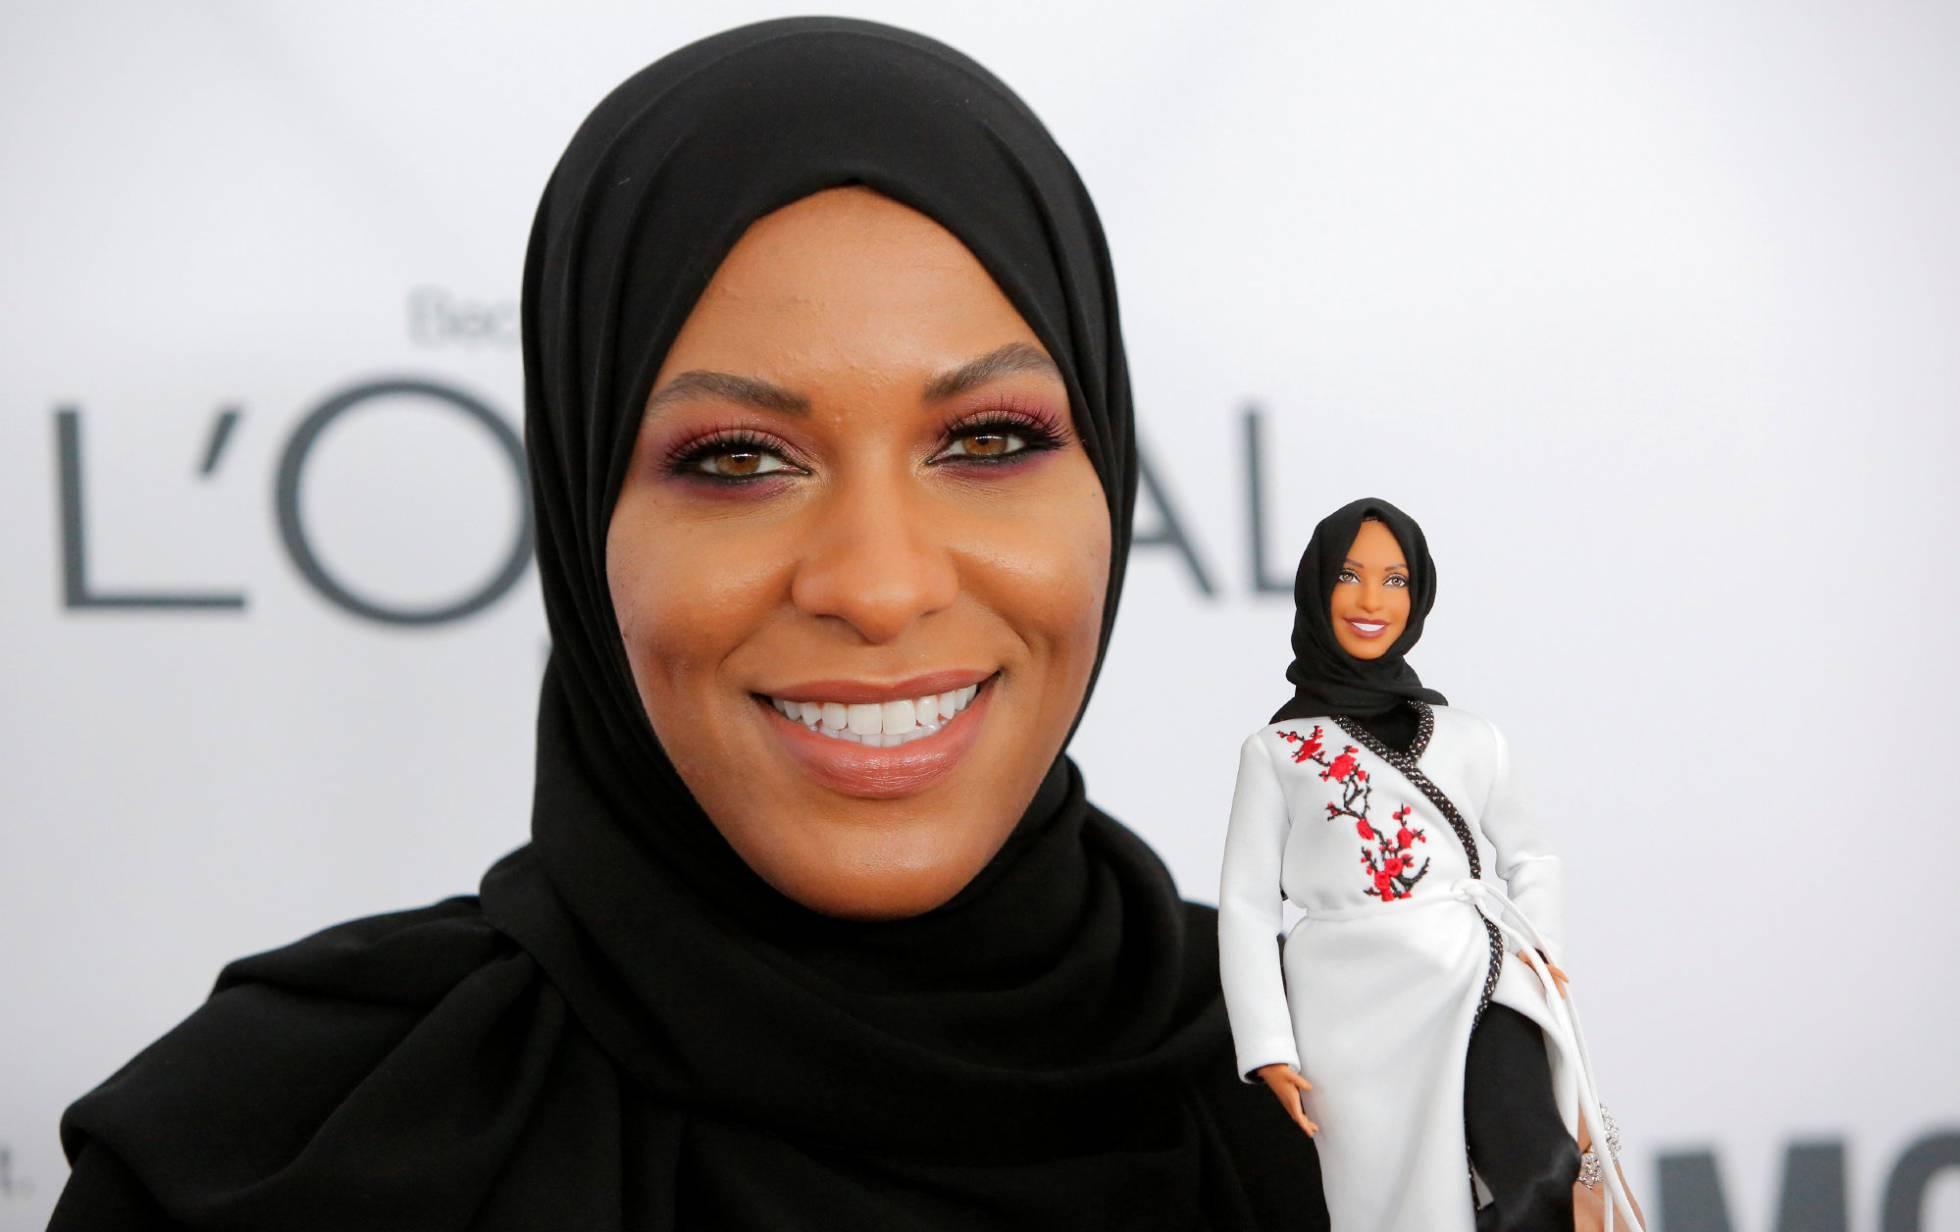 Mattel tendrá una Barbie en honor a la esgrimista Ibtihaj Muhammad.